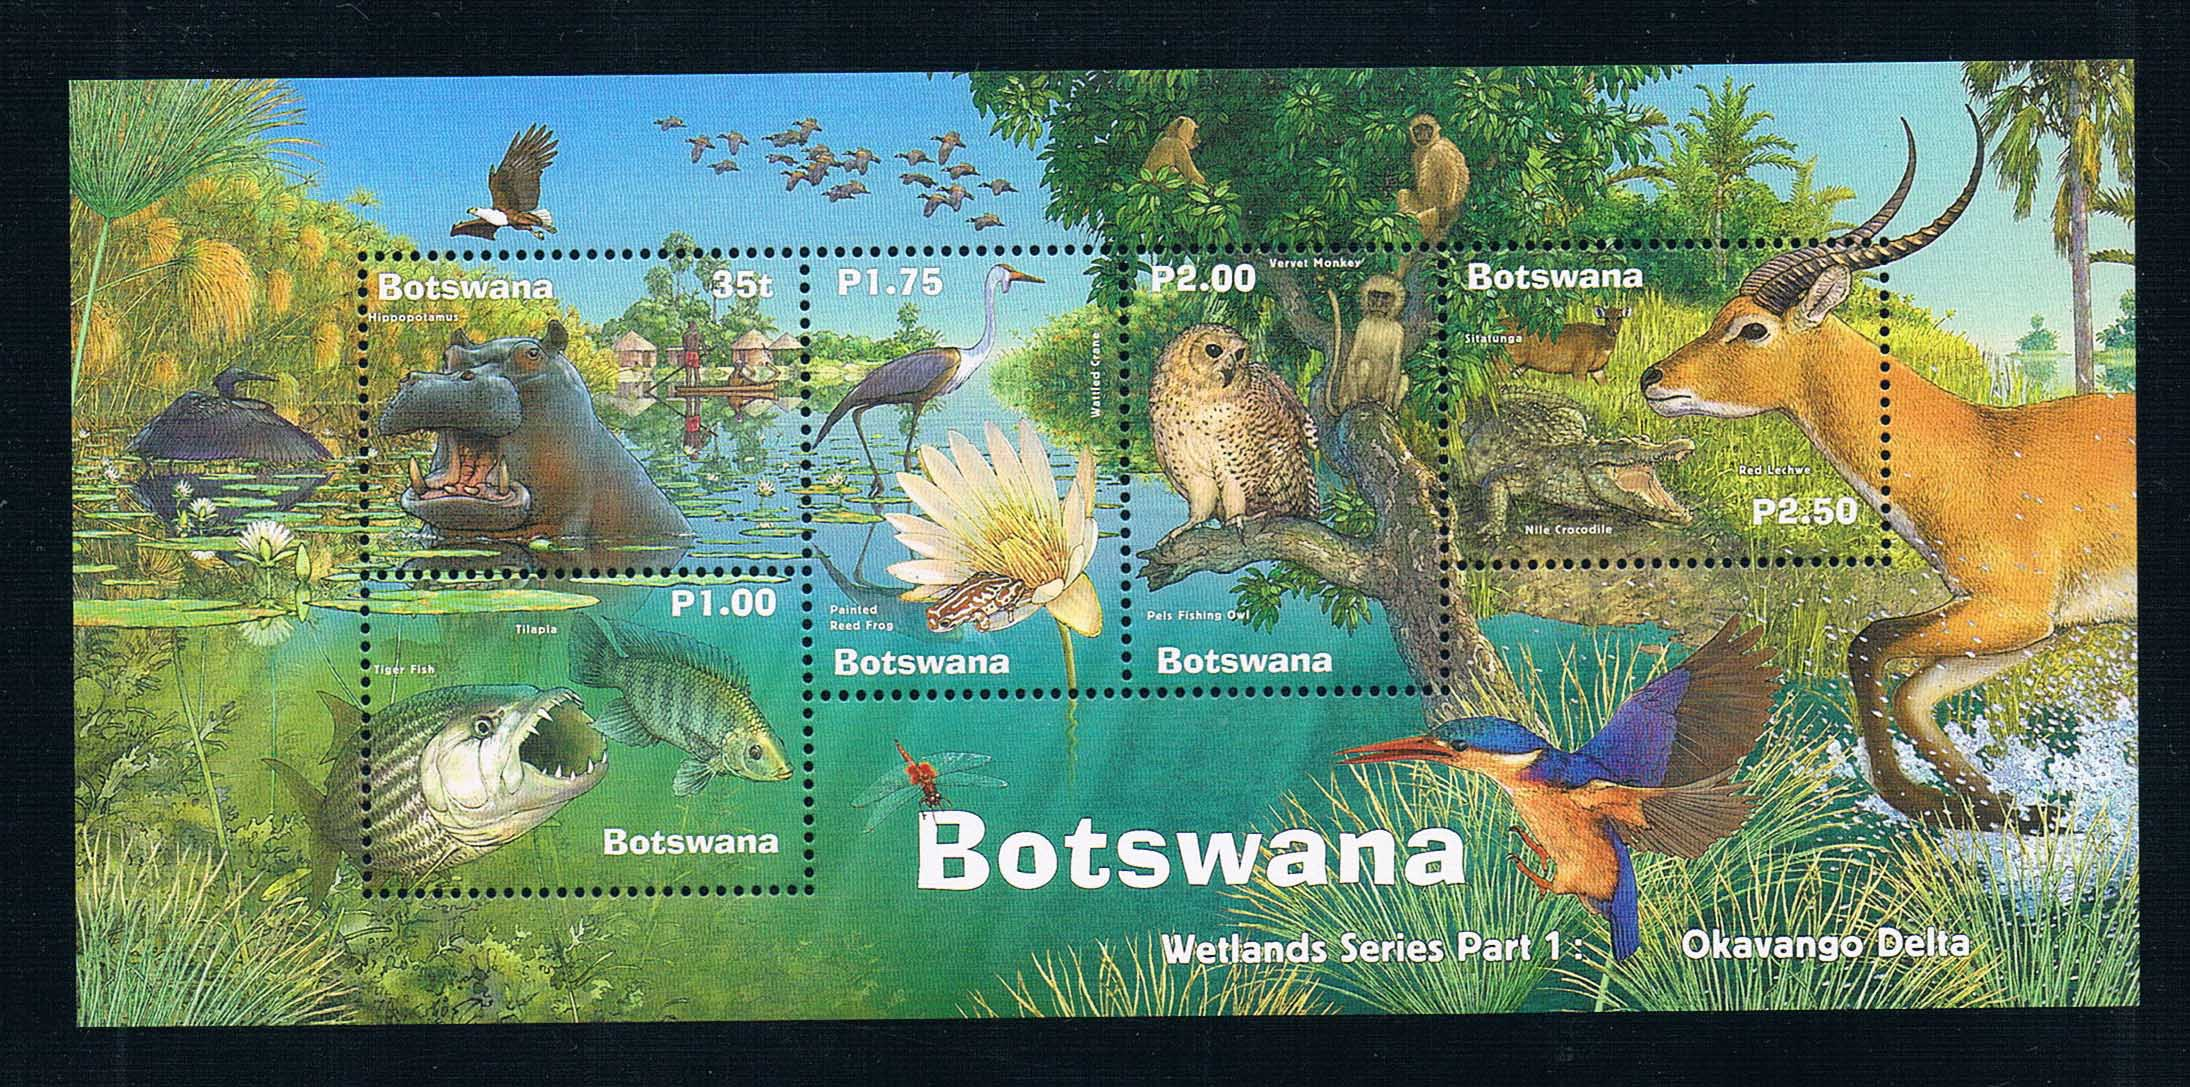 2000 EA3416 Botswana wetland group first World Heritage Okavango 1MS new 1210 awo sp lamp 016 replacement projector lamp compatible module for infocus lp850 lp860 ask c450 c460 proxima dp8500x